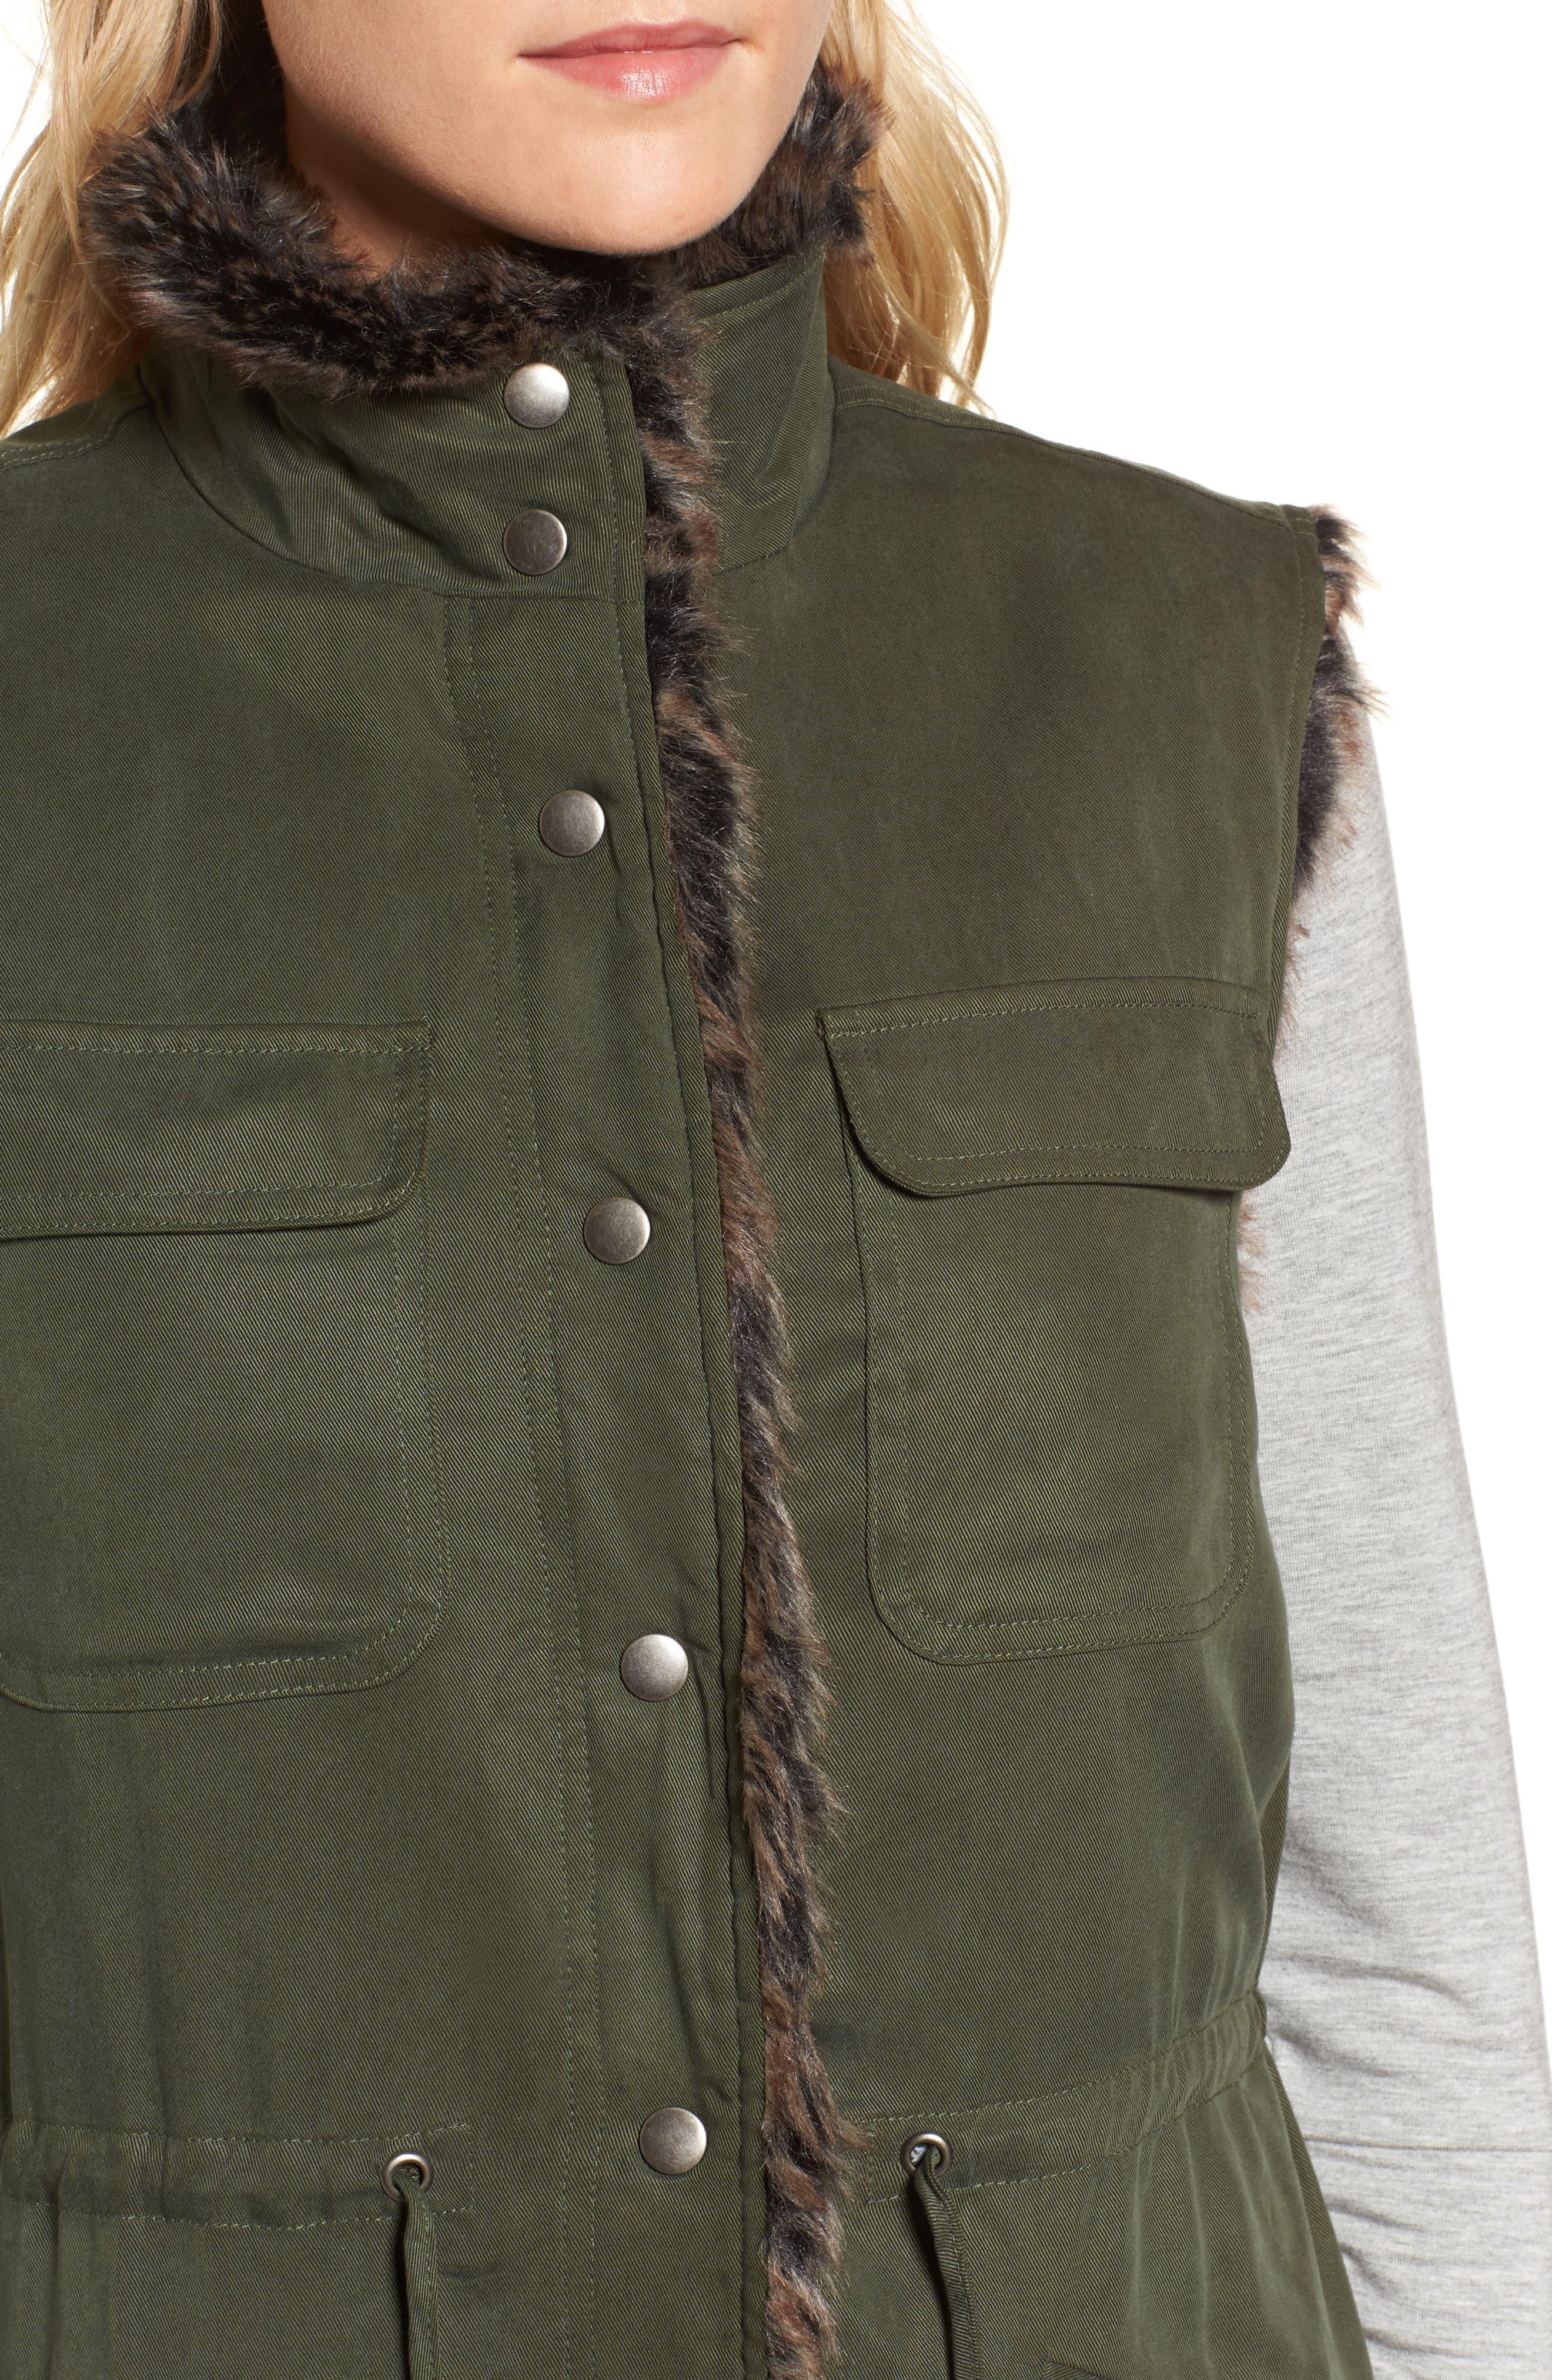 Ashling Faux Fur Lined Utility Vest,                             Alternate thumbnail 4, color,                             Army